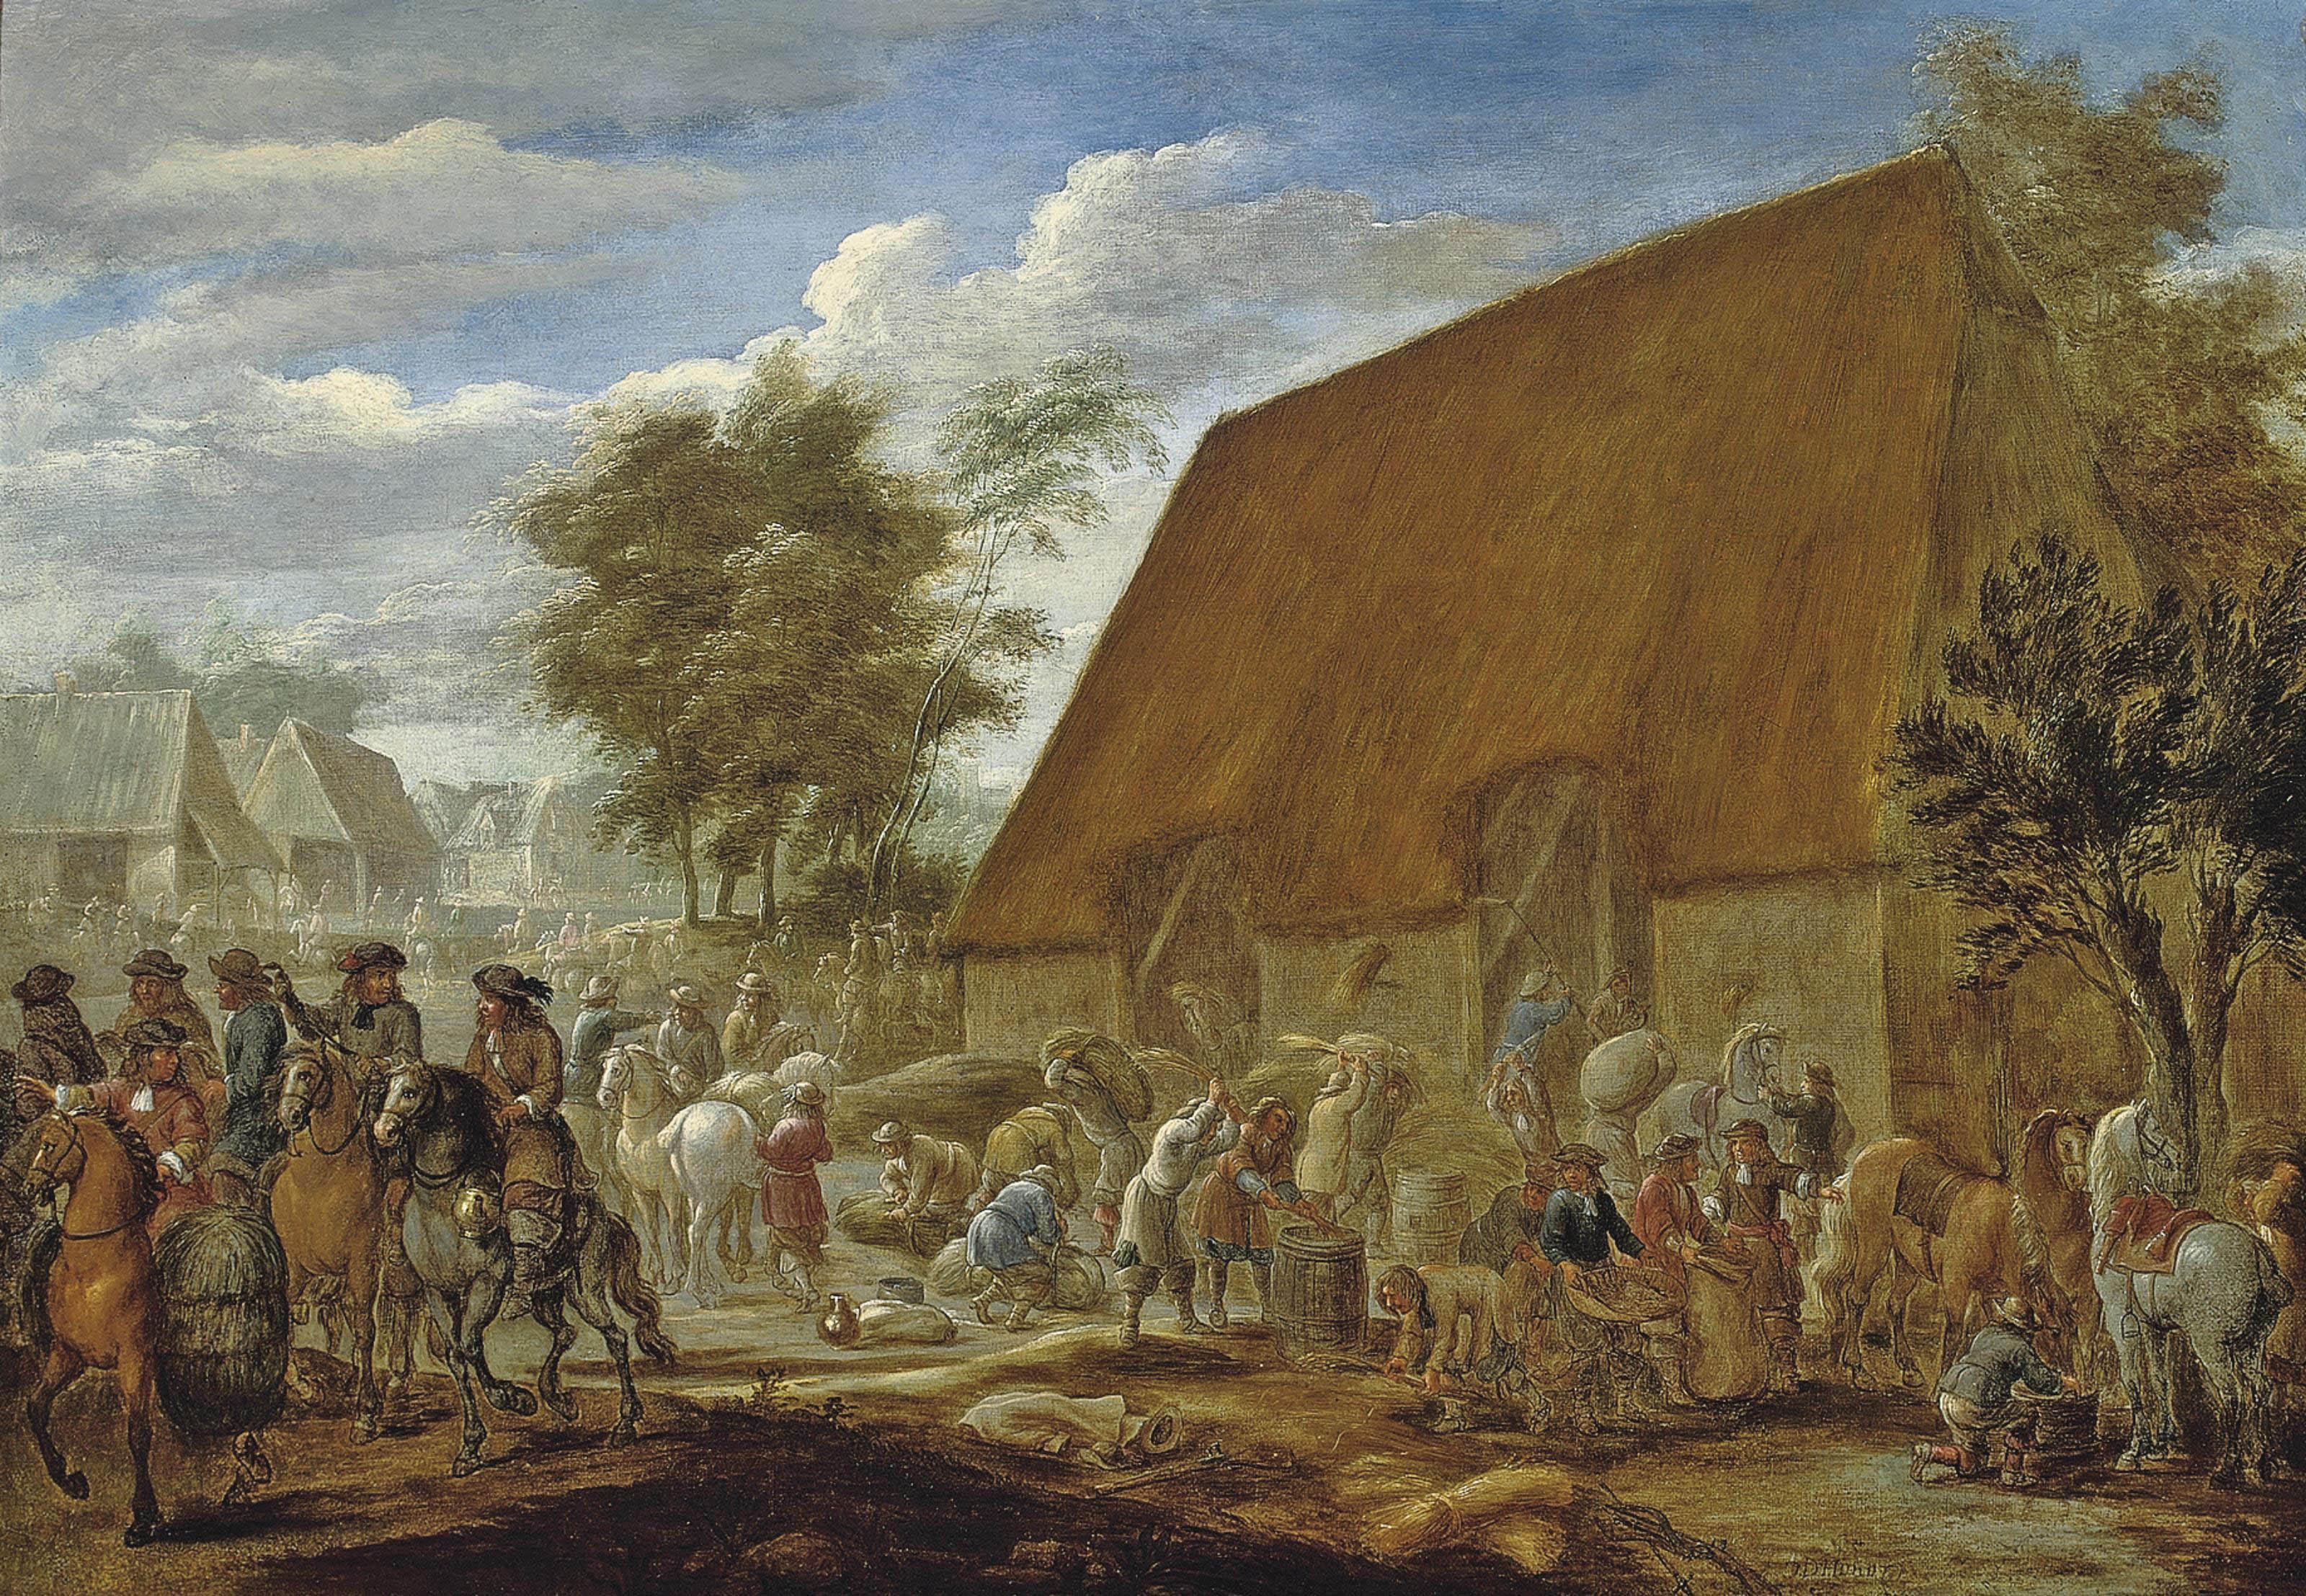 Farmers threshing corn before a thatched barn